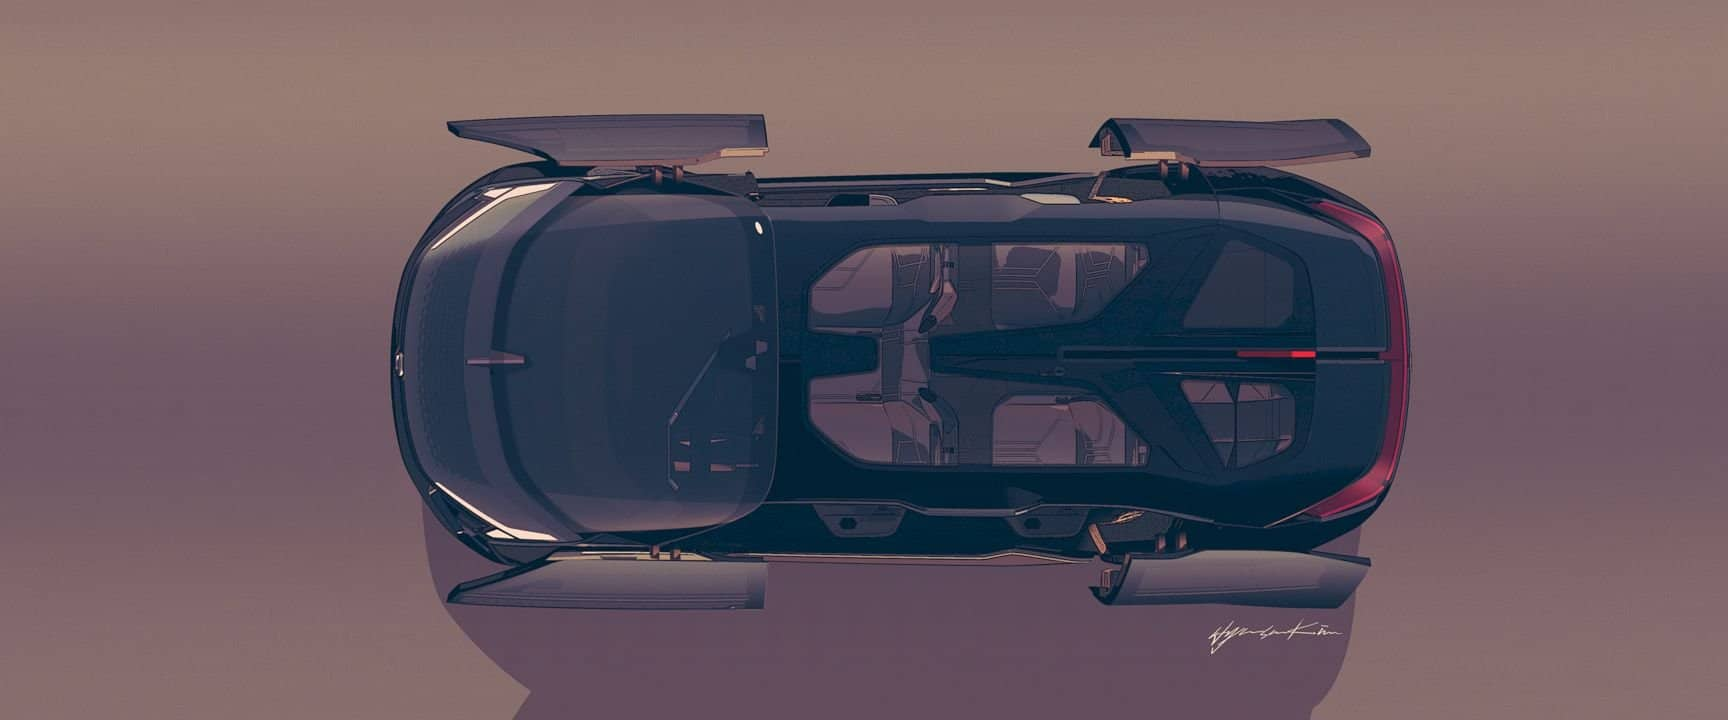 Gac Entranze Ev Concept 6